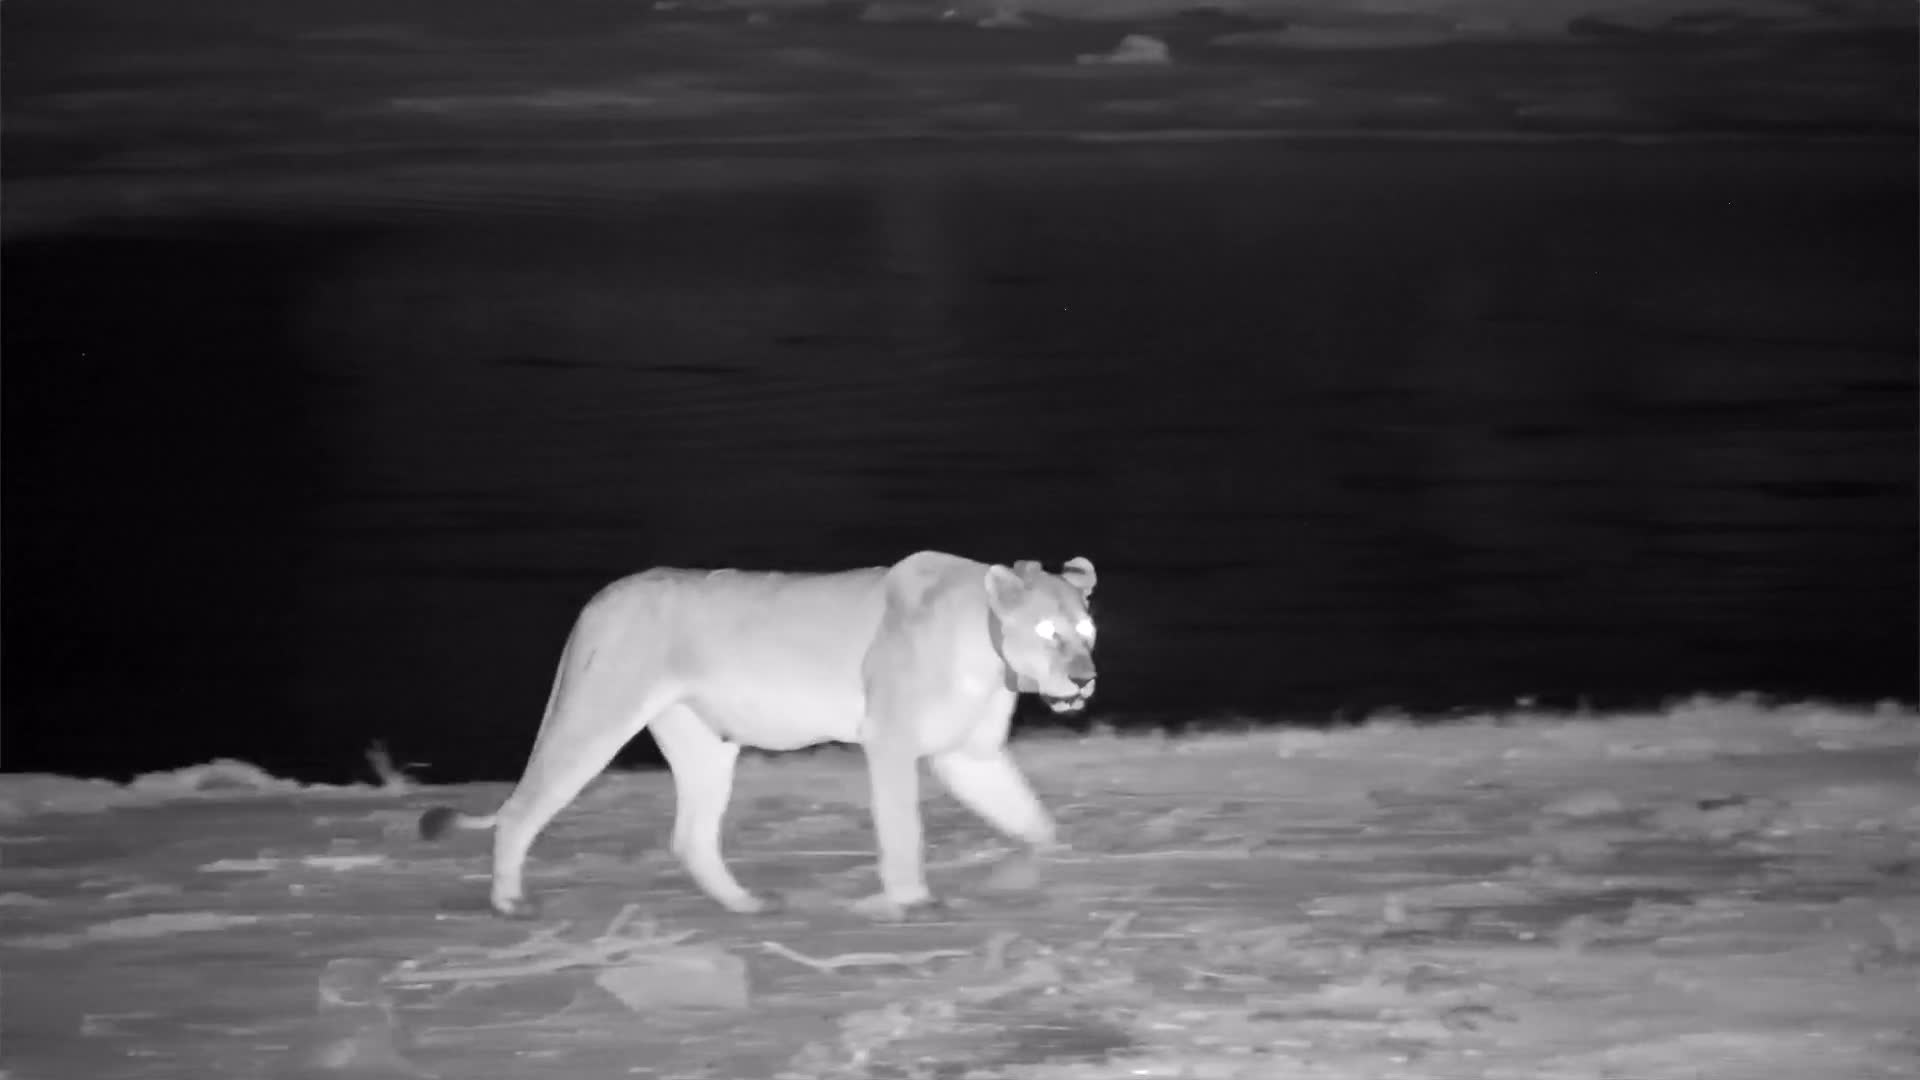 VIDEO: Lion leaving the waterhole roaring along the way